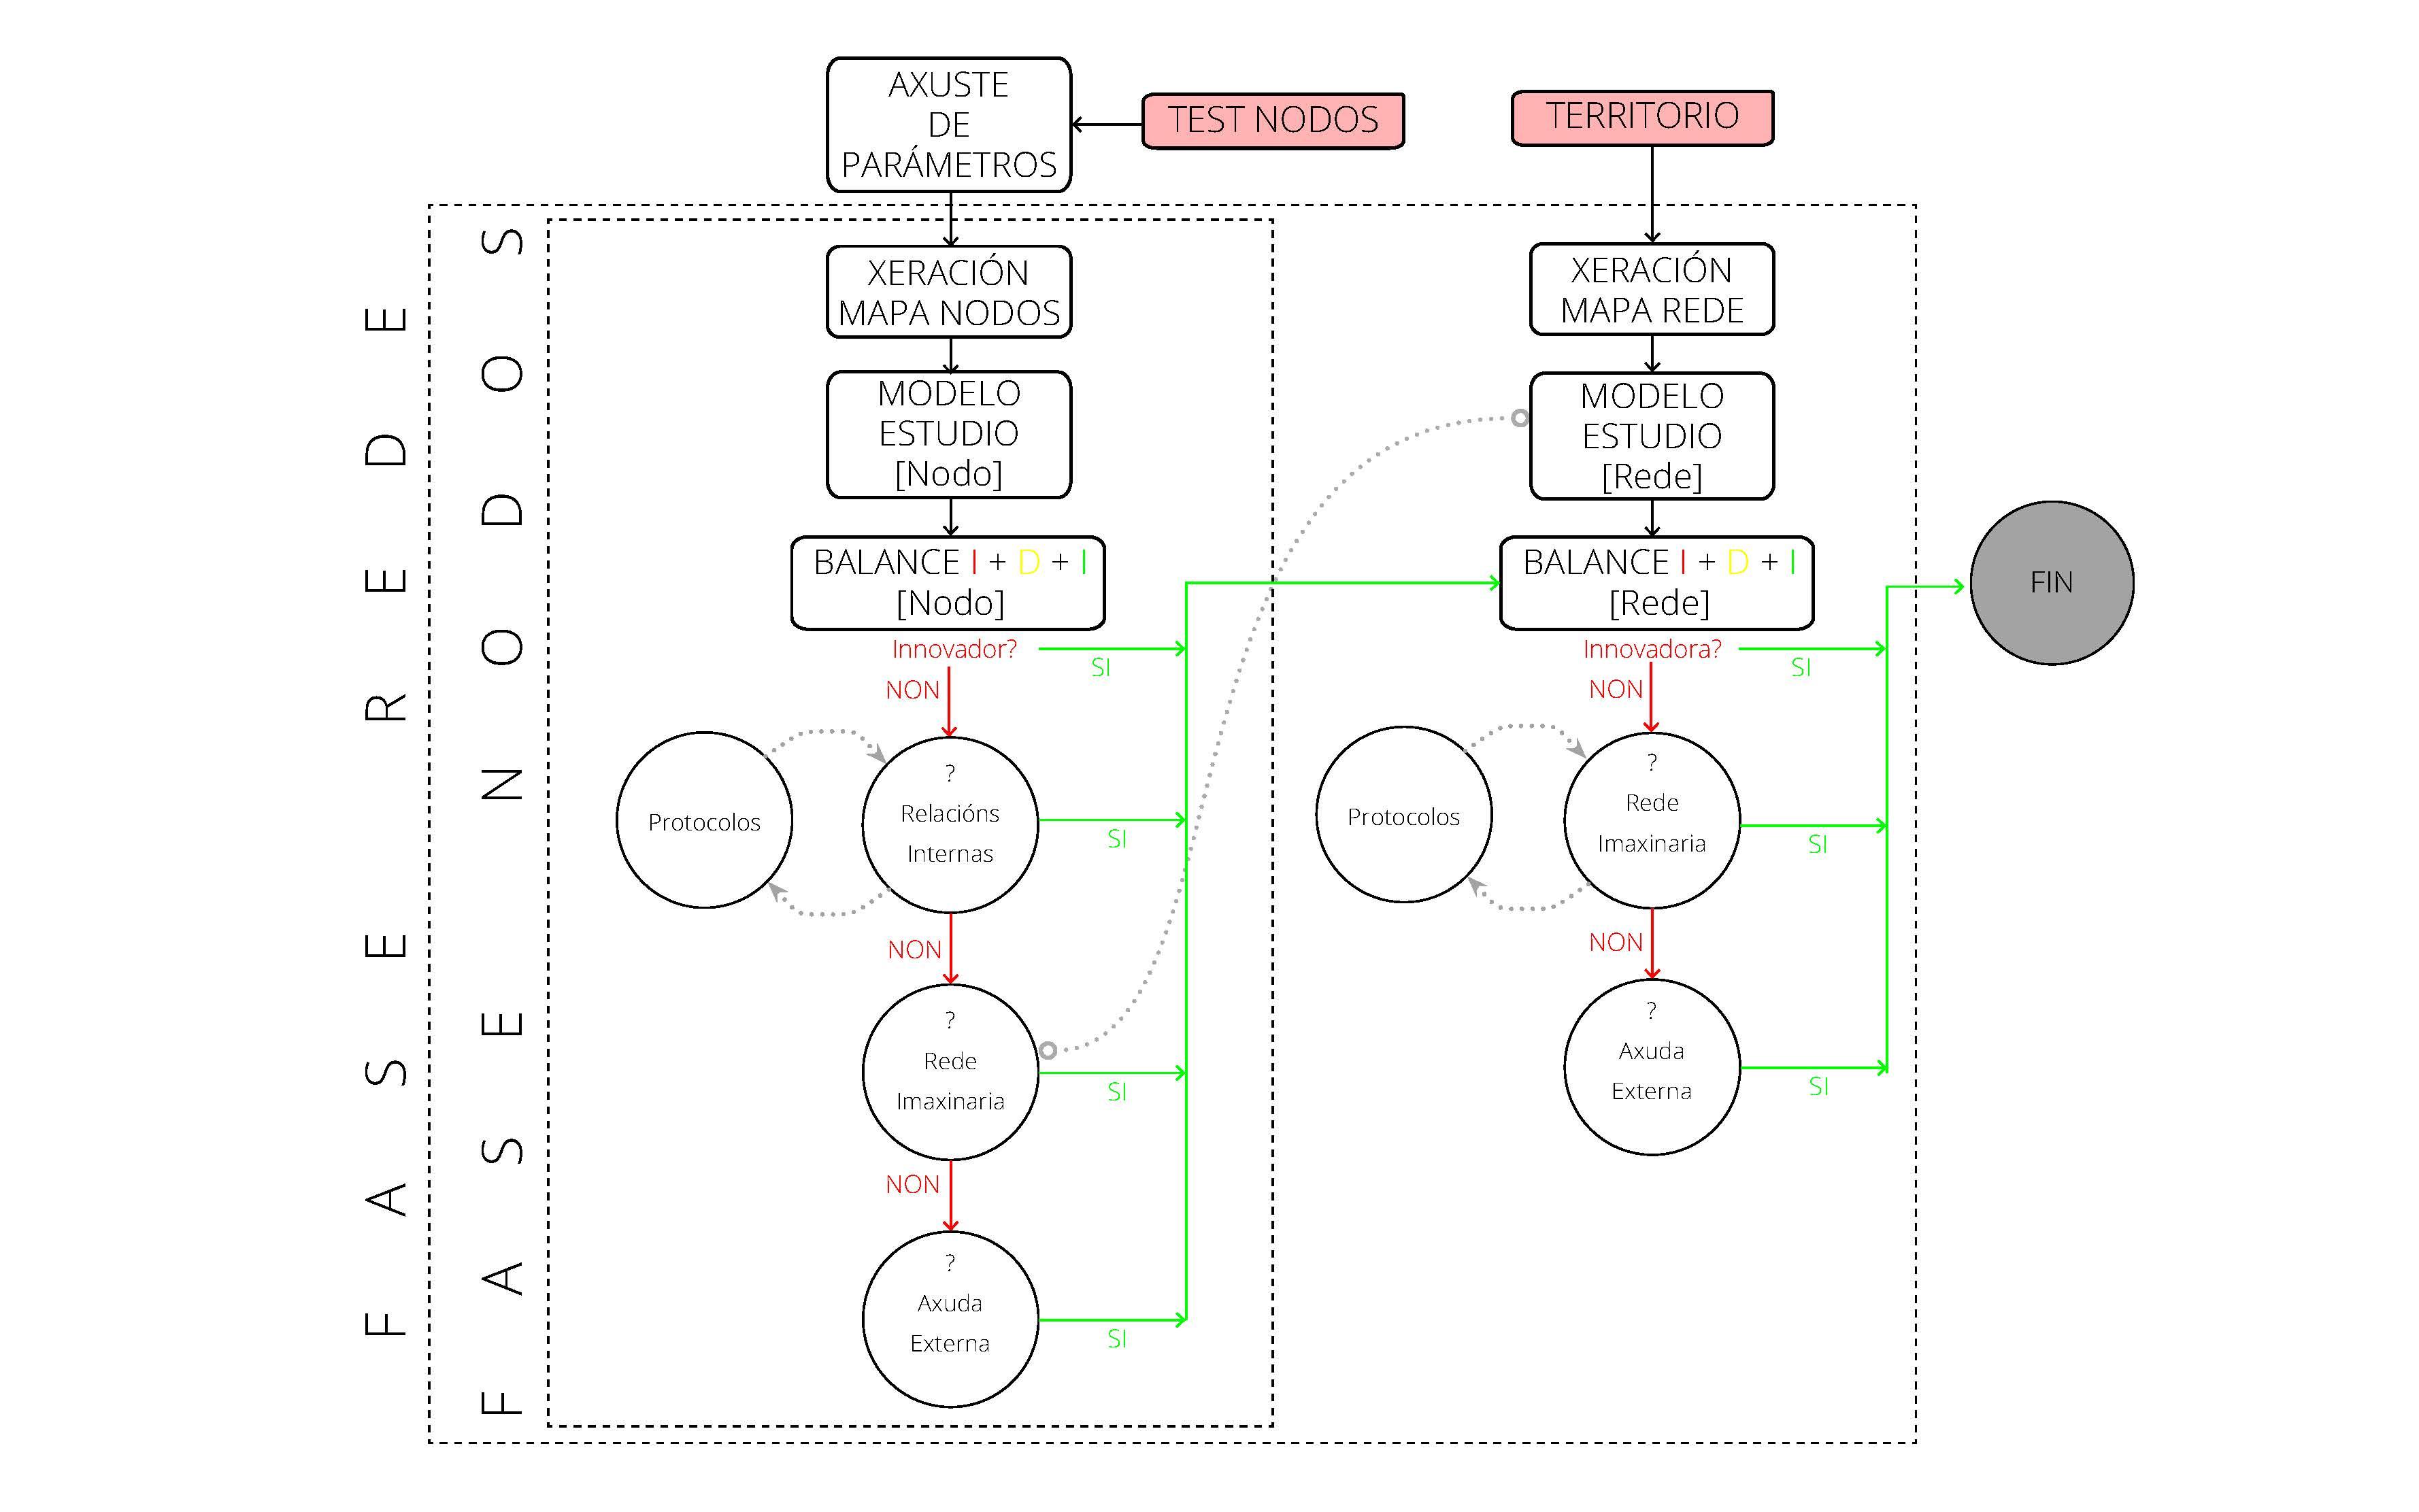 diagramalogico